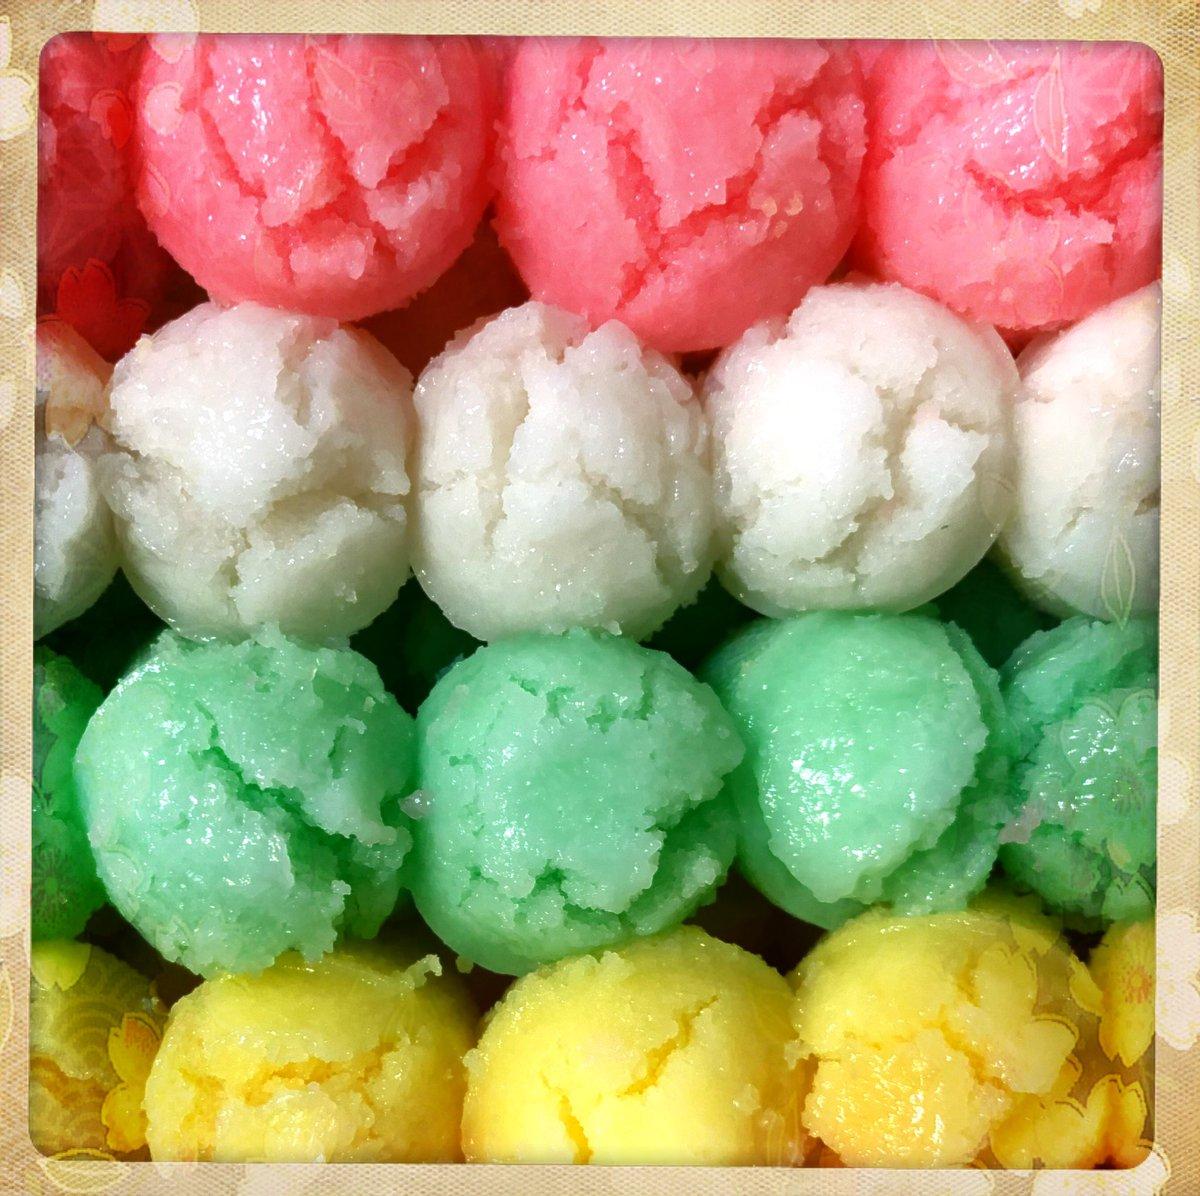 Nom nom on these #dessert #RiceBalls 🍚🍡🥥  - #Food #Sweets #RiceCake https://t.co/ZCZGUdkDU2